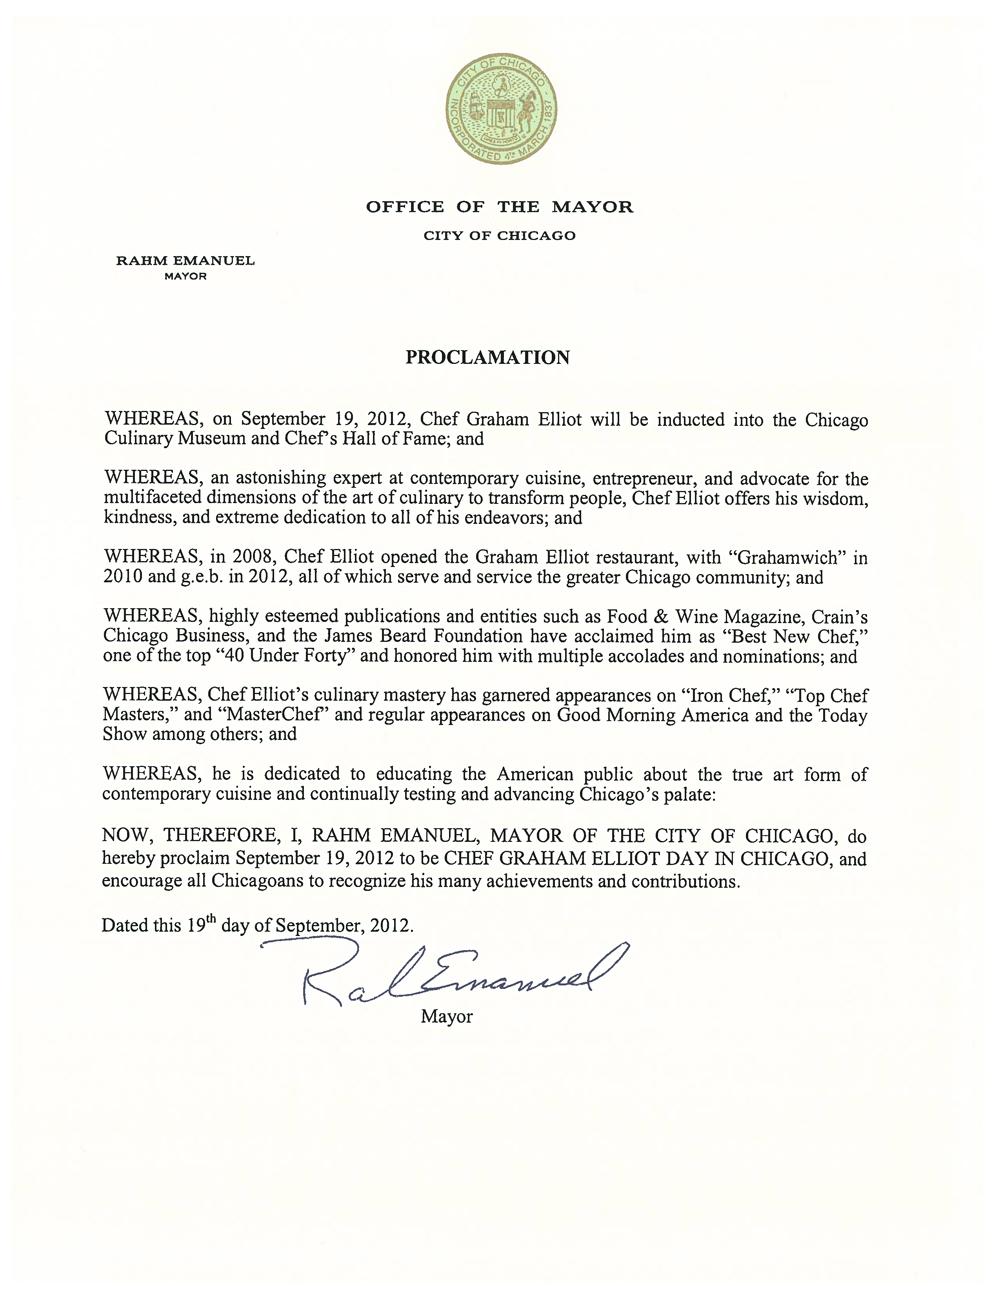 GE-Day-Proclamation-091912.jpg